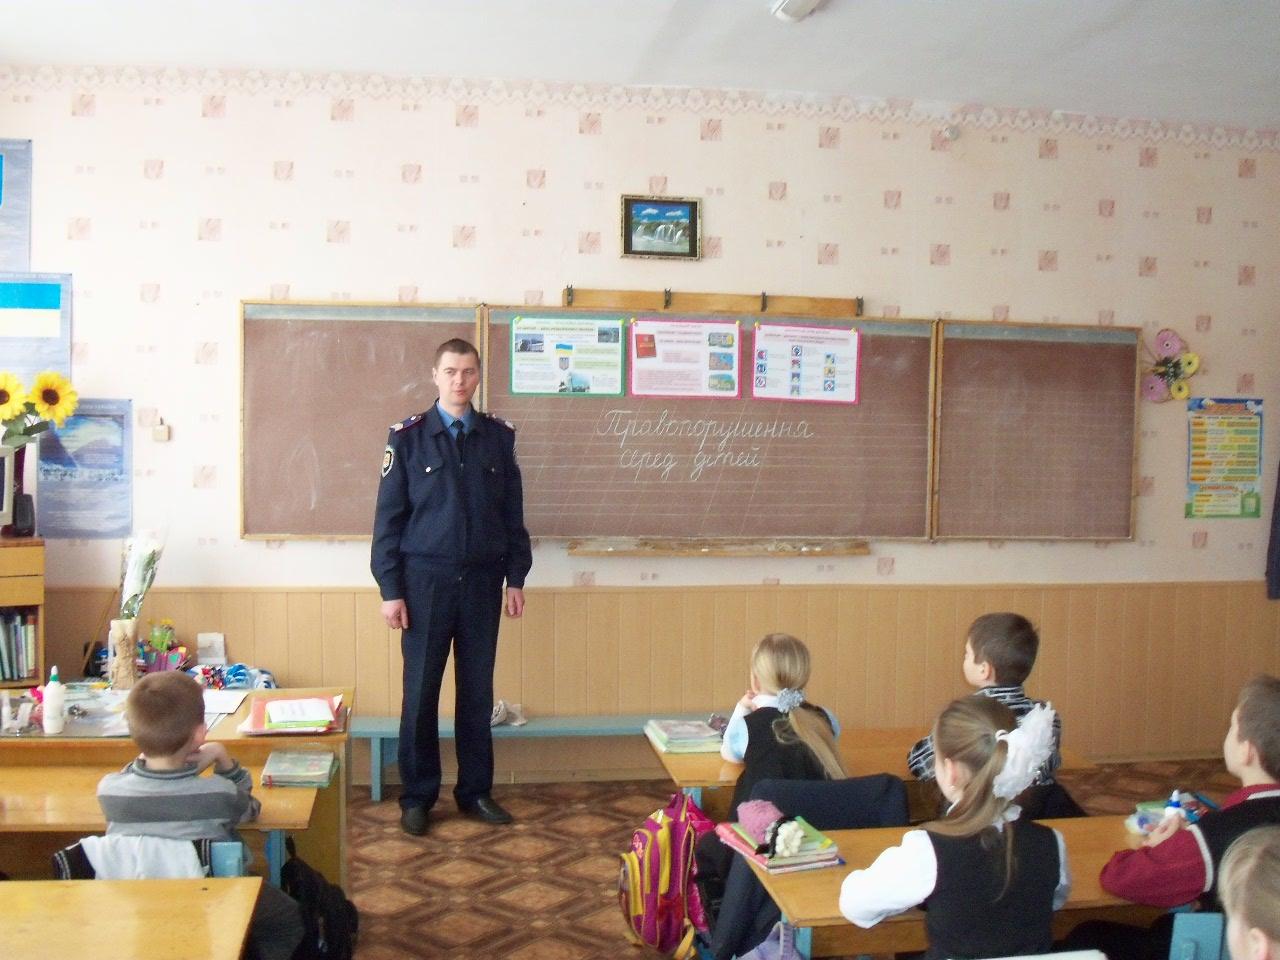 http://karl-gymnasium.at.ua/class_visti/5554551.jpg